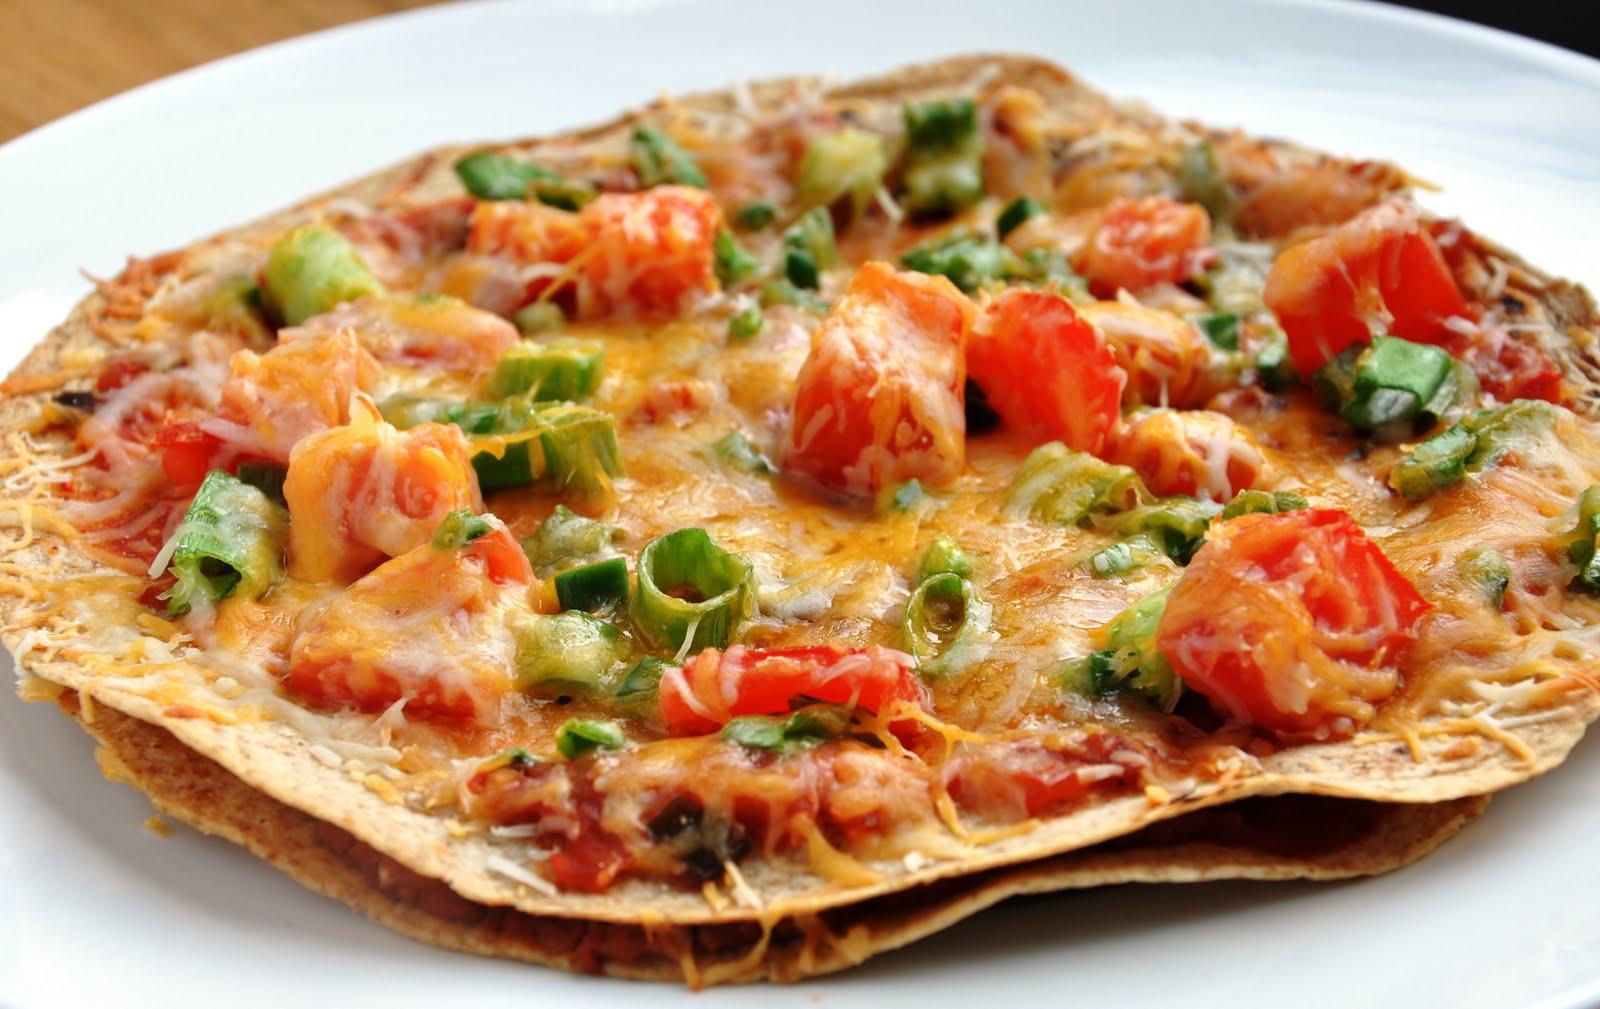 ... quesadilla pizzas lavash flatbread pizzas armenian pizzas lahmahjoon